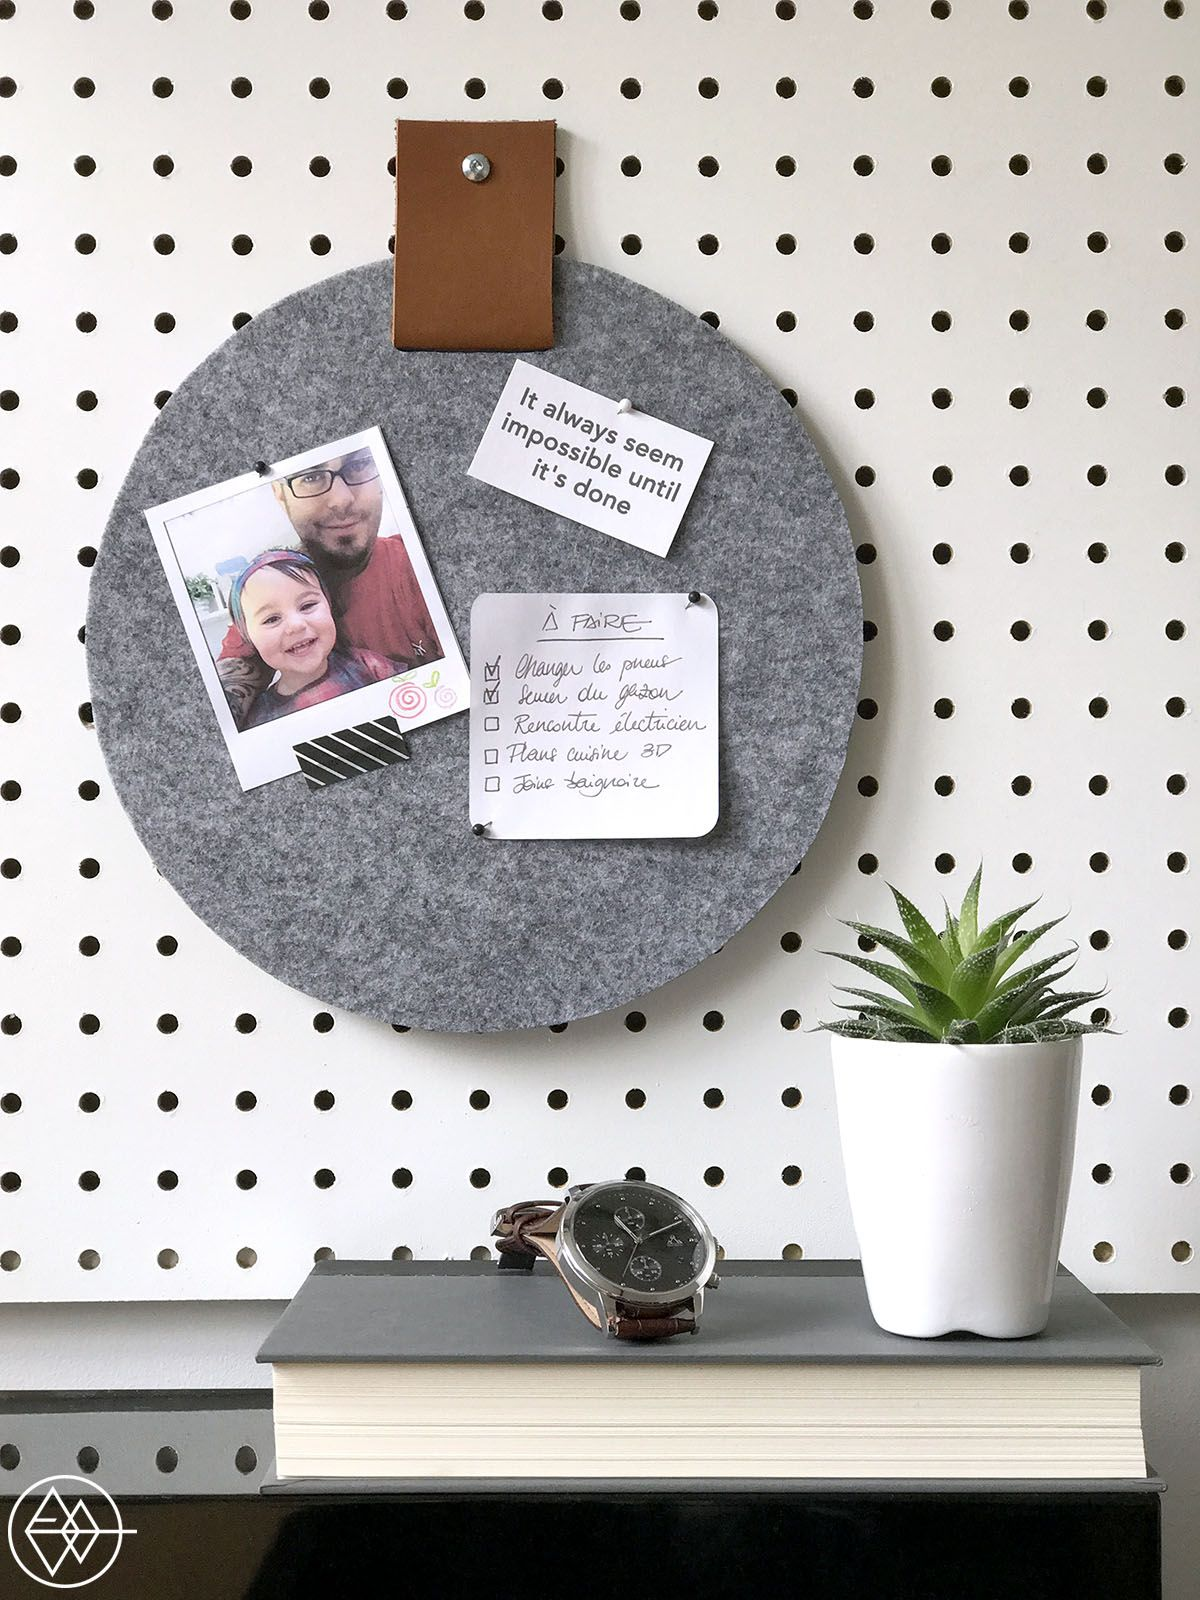 DIY pinboard | DIY | Pinterest